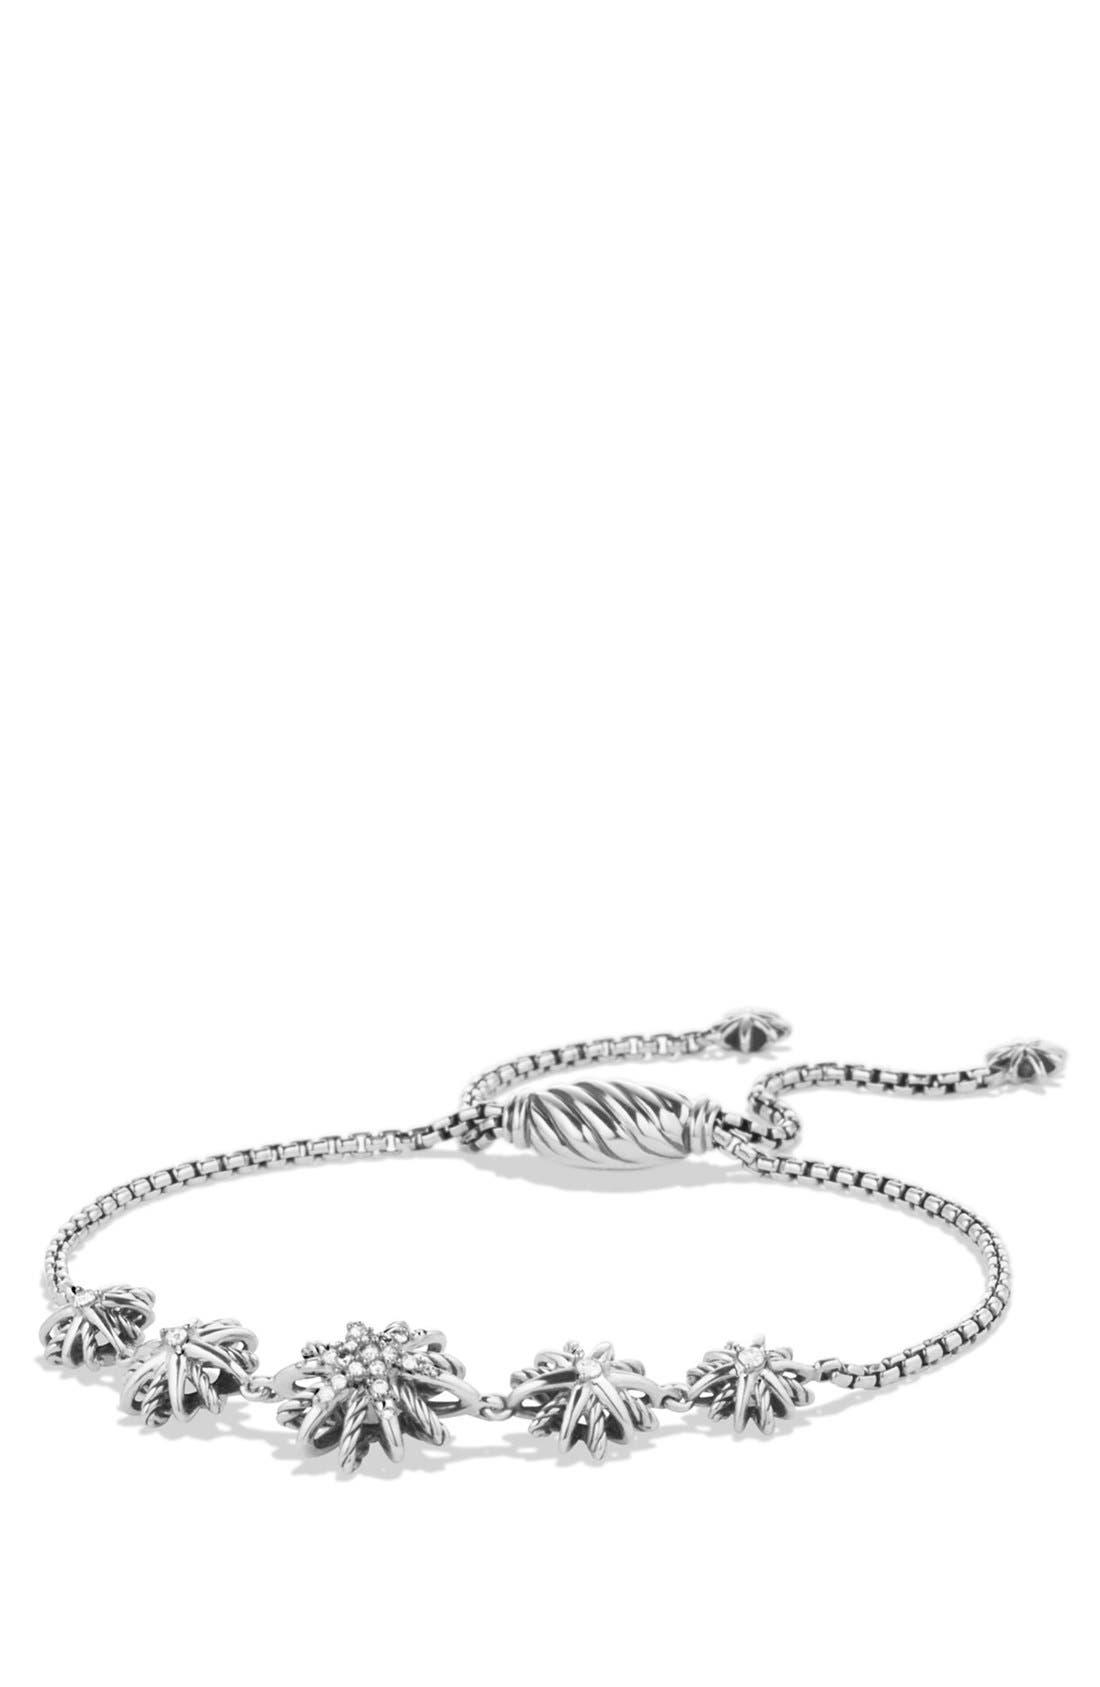 David Yurman 'Starburst' Five-Station Bracelet with Diamonds